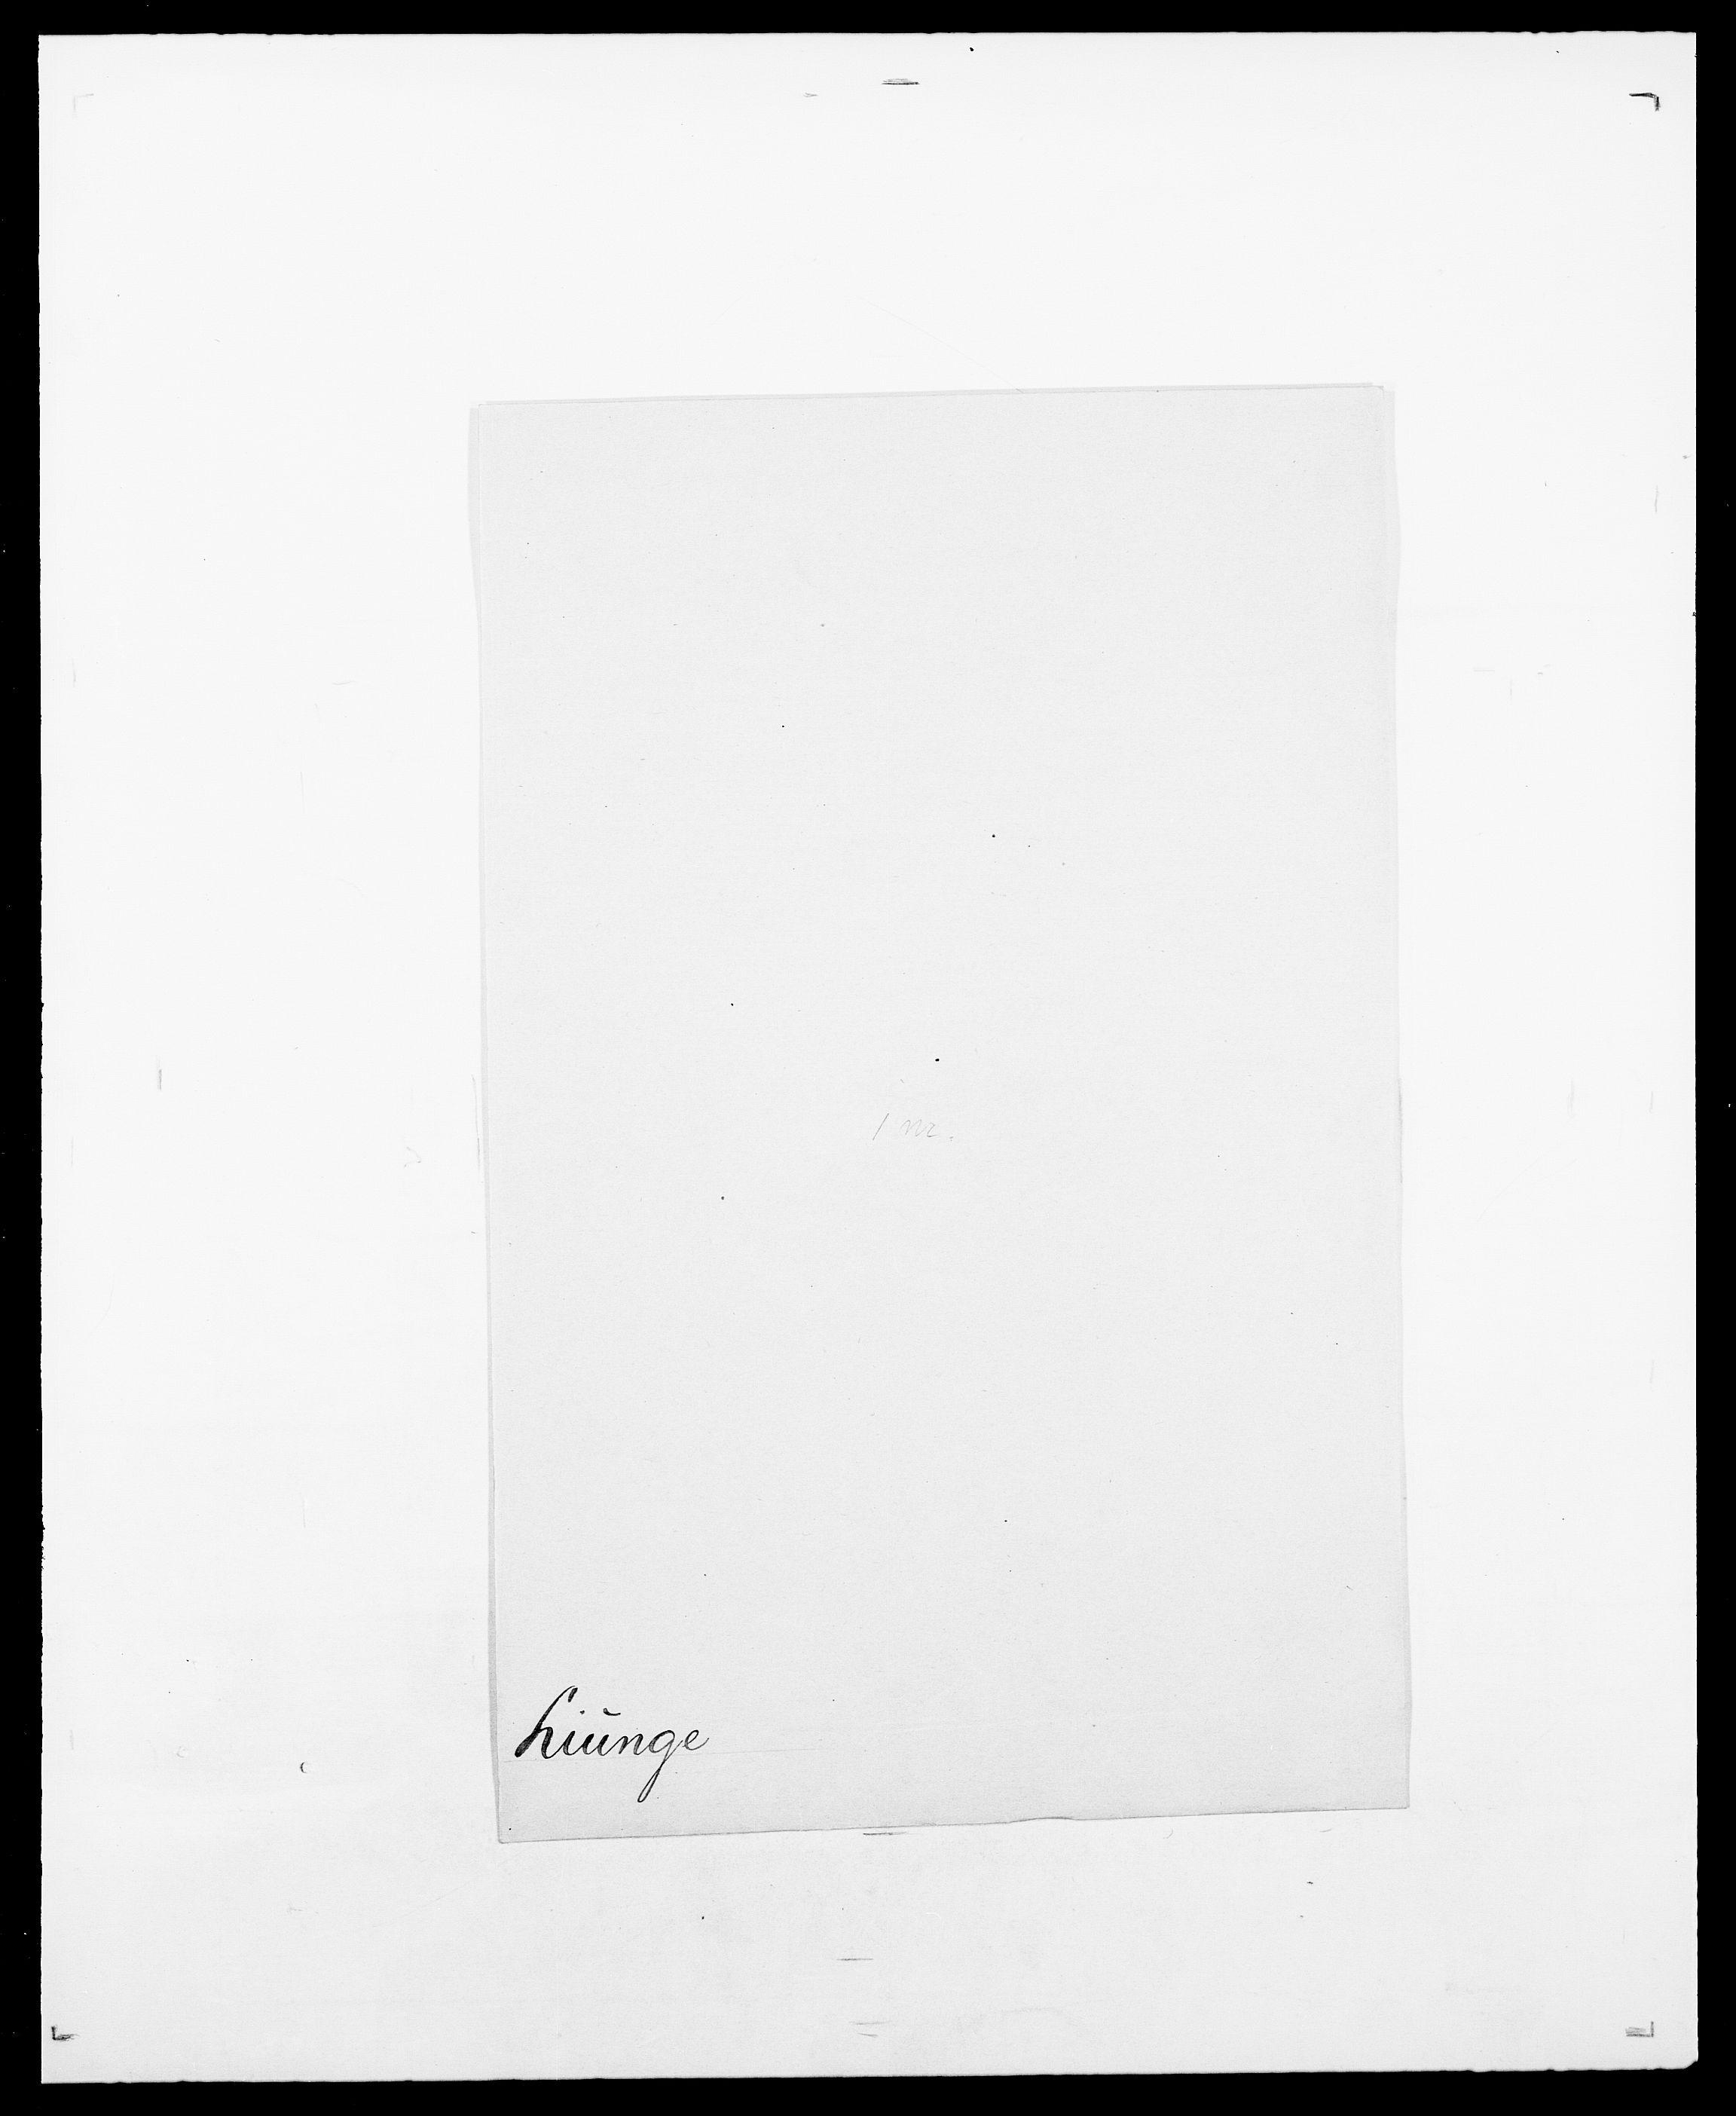 SAO, Delgobe, Charles Antoine - samling, D/Da/L0023: Lau - Lirvyn, s. 712